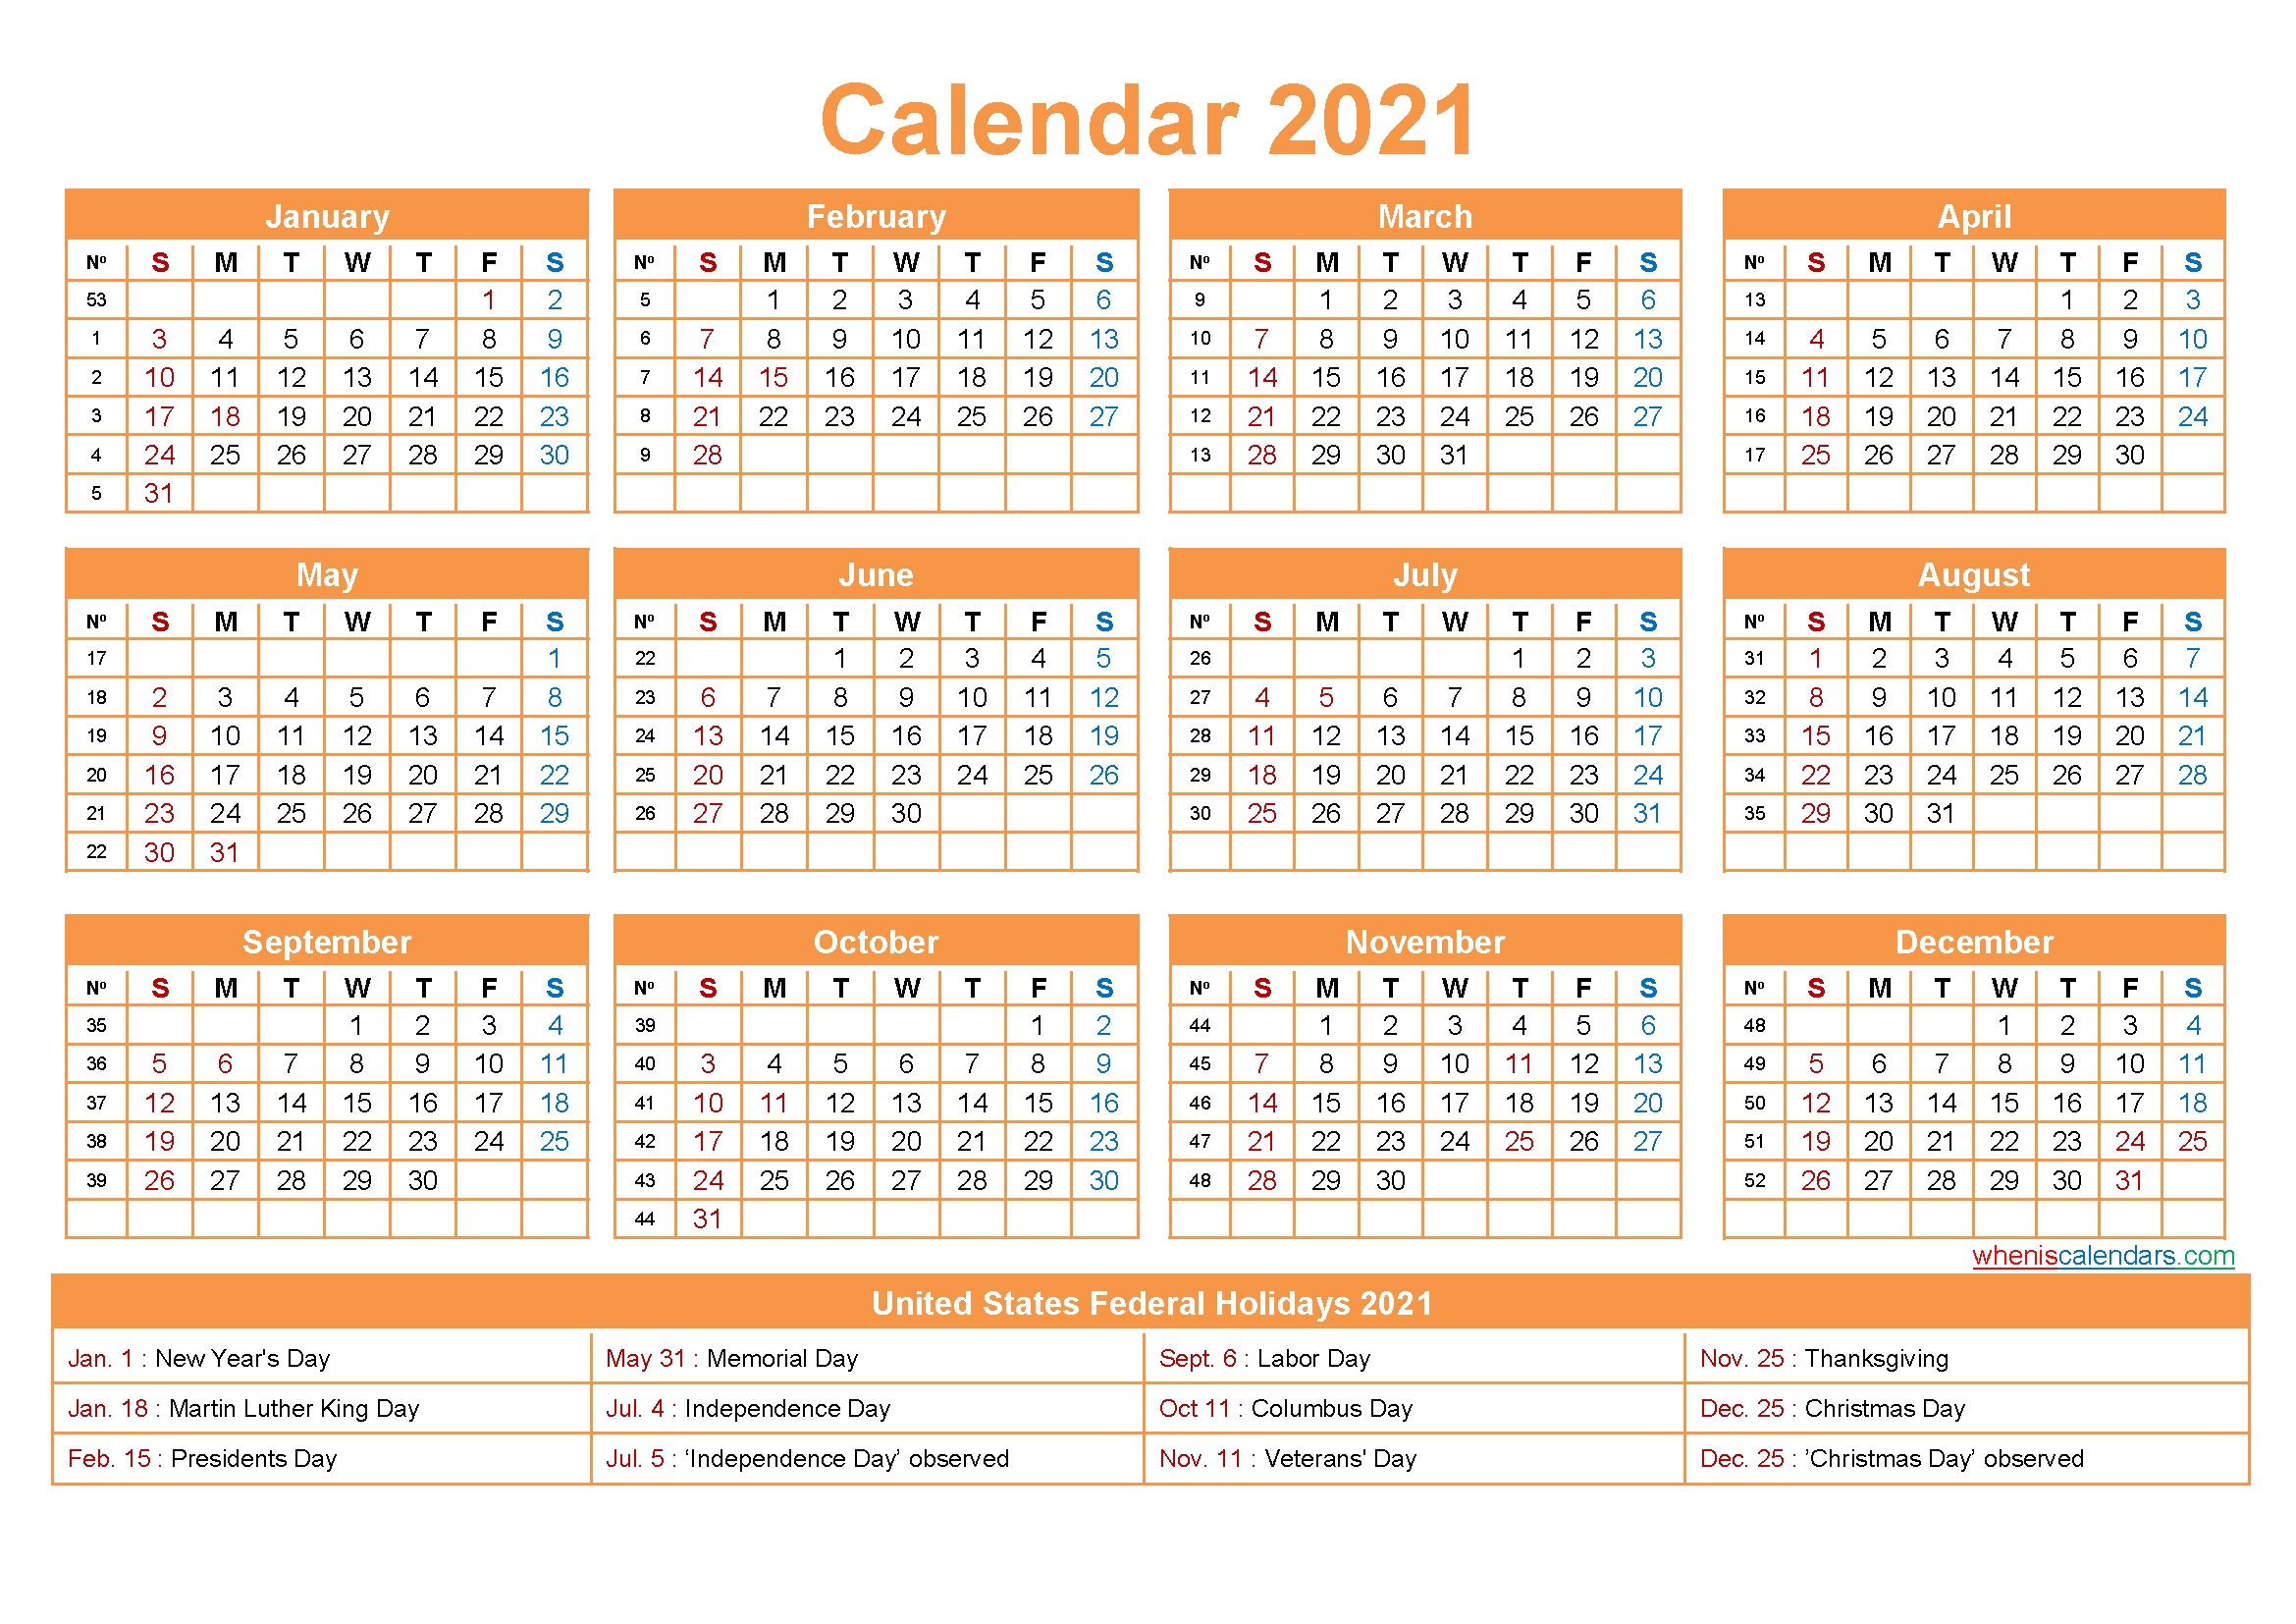 Free Downloadable 2021 Word Calendar - Take 2021 Printable Calendar Free | Calendar Printables